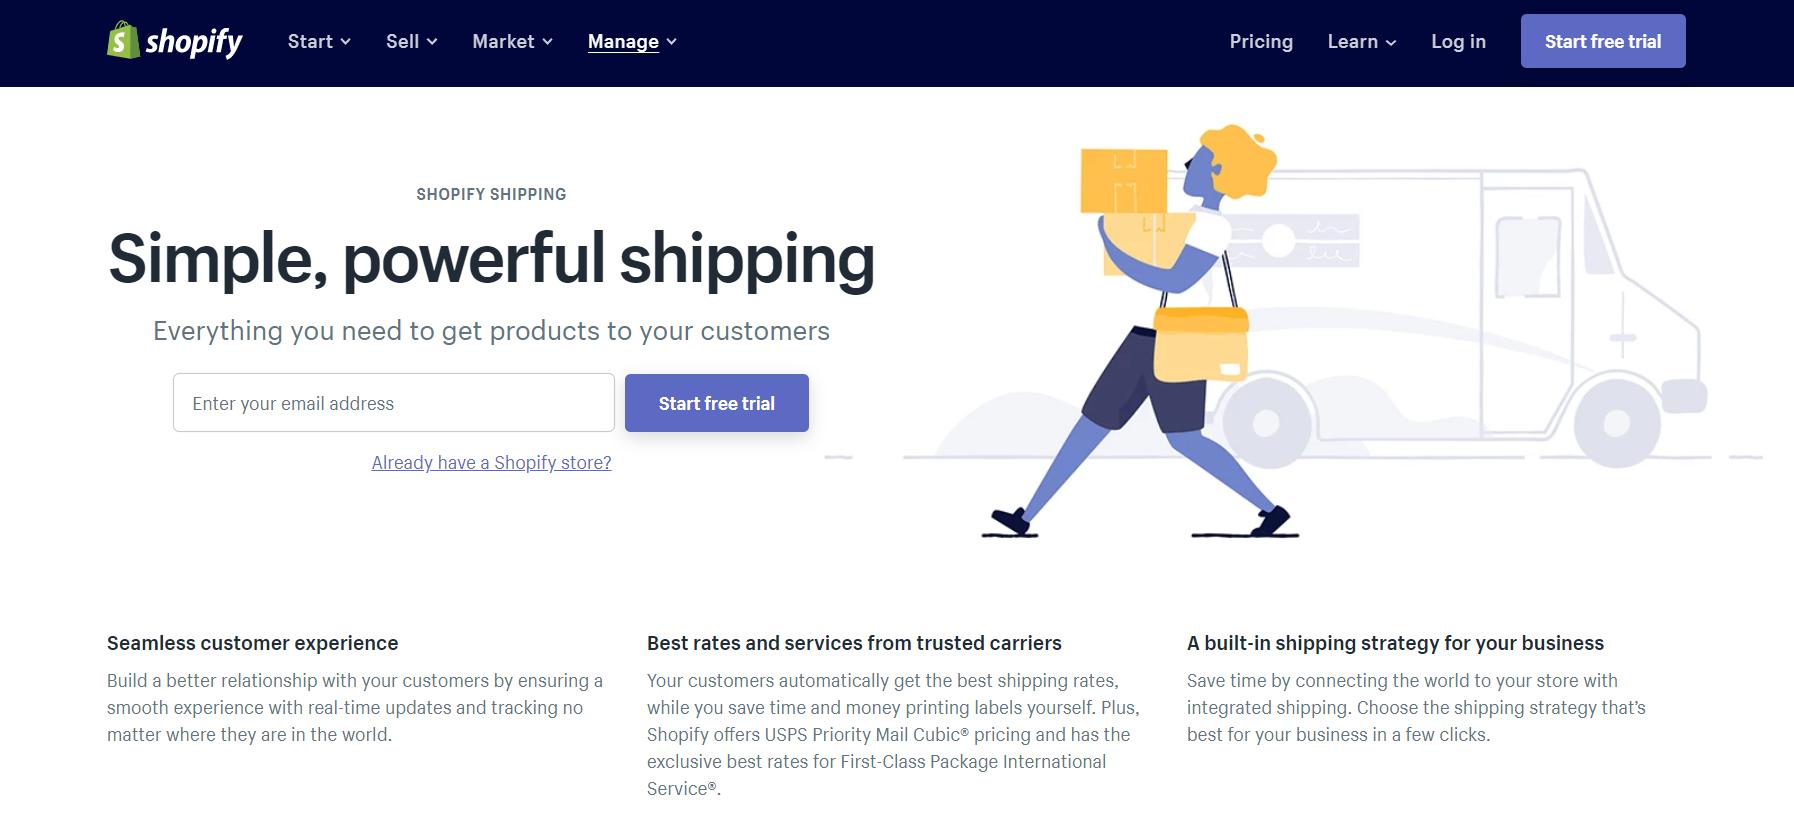 shopify shipping software